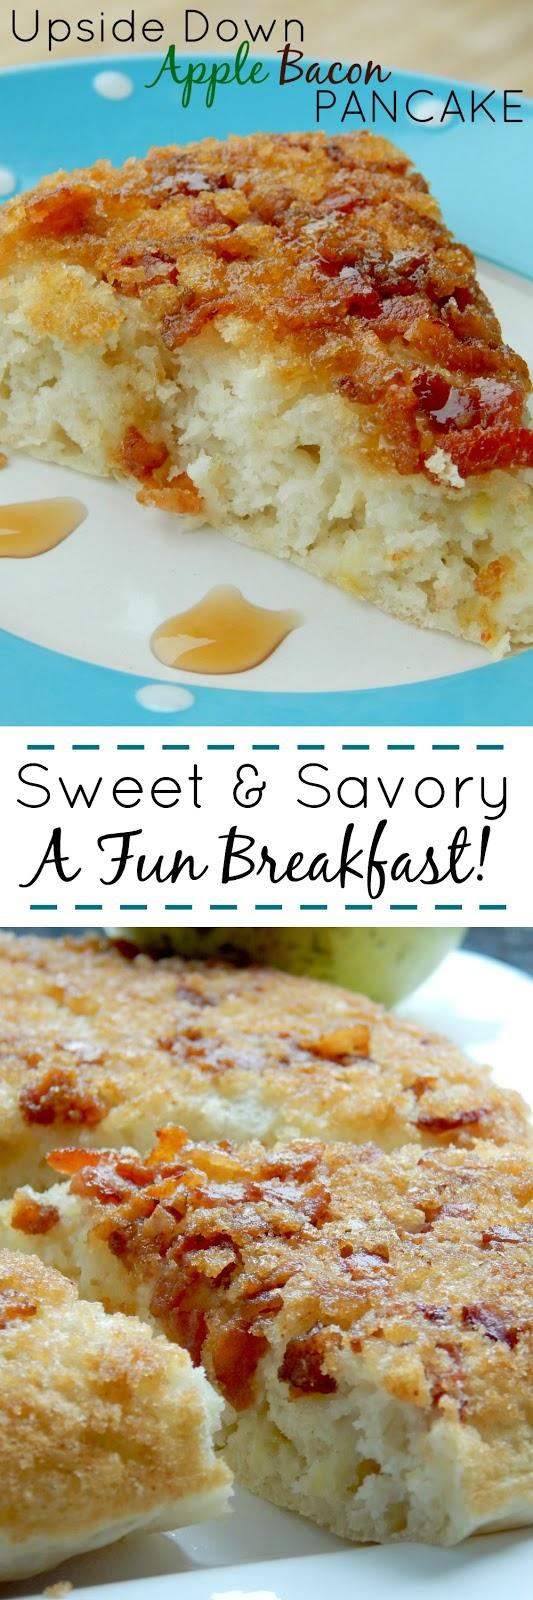 updside down apple bacon pancake (sweetandsavoryfood.com)